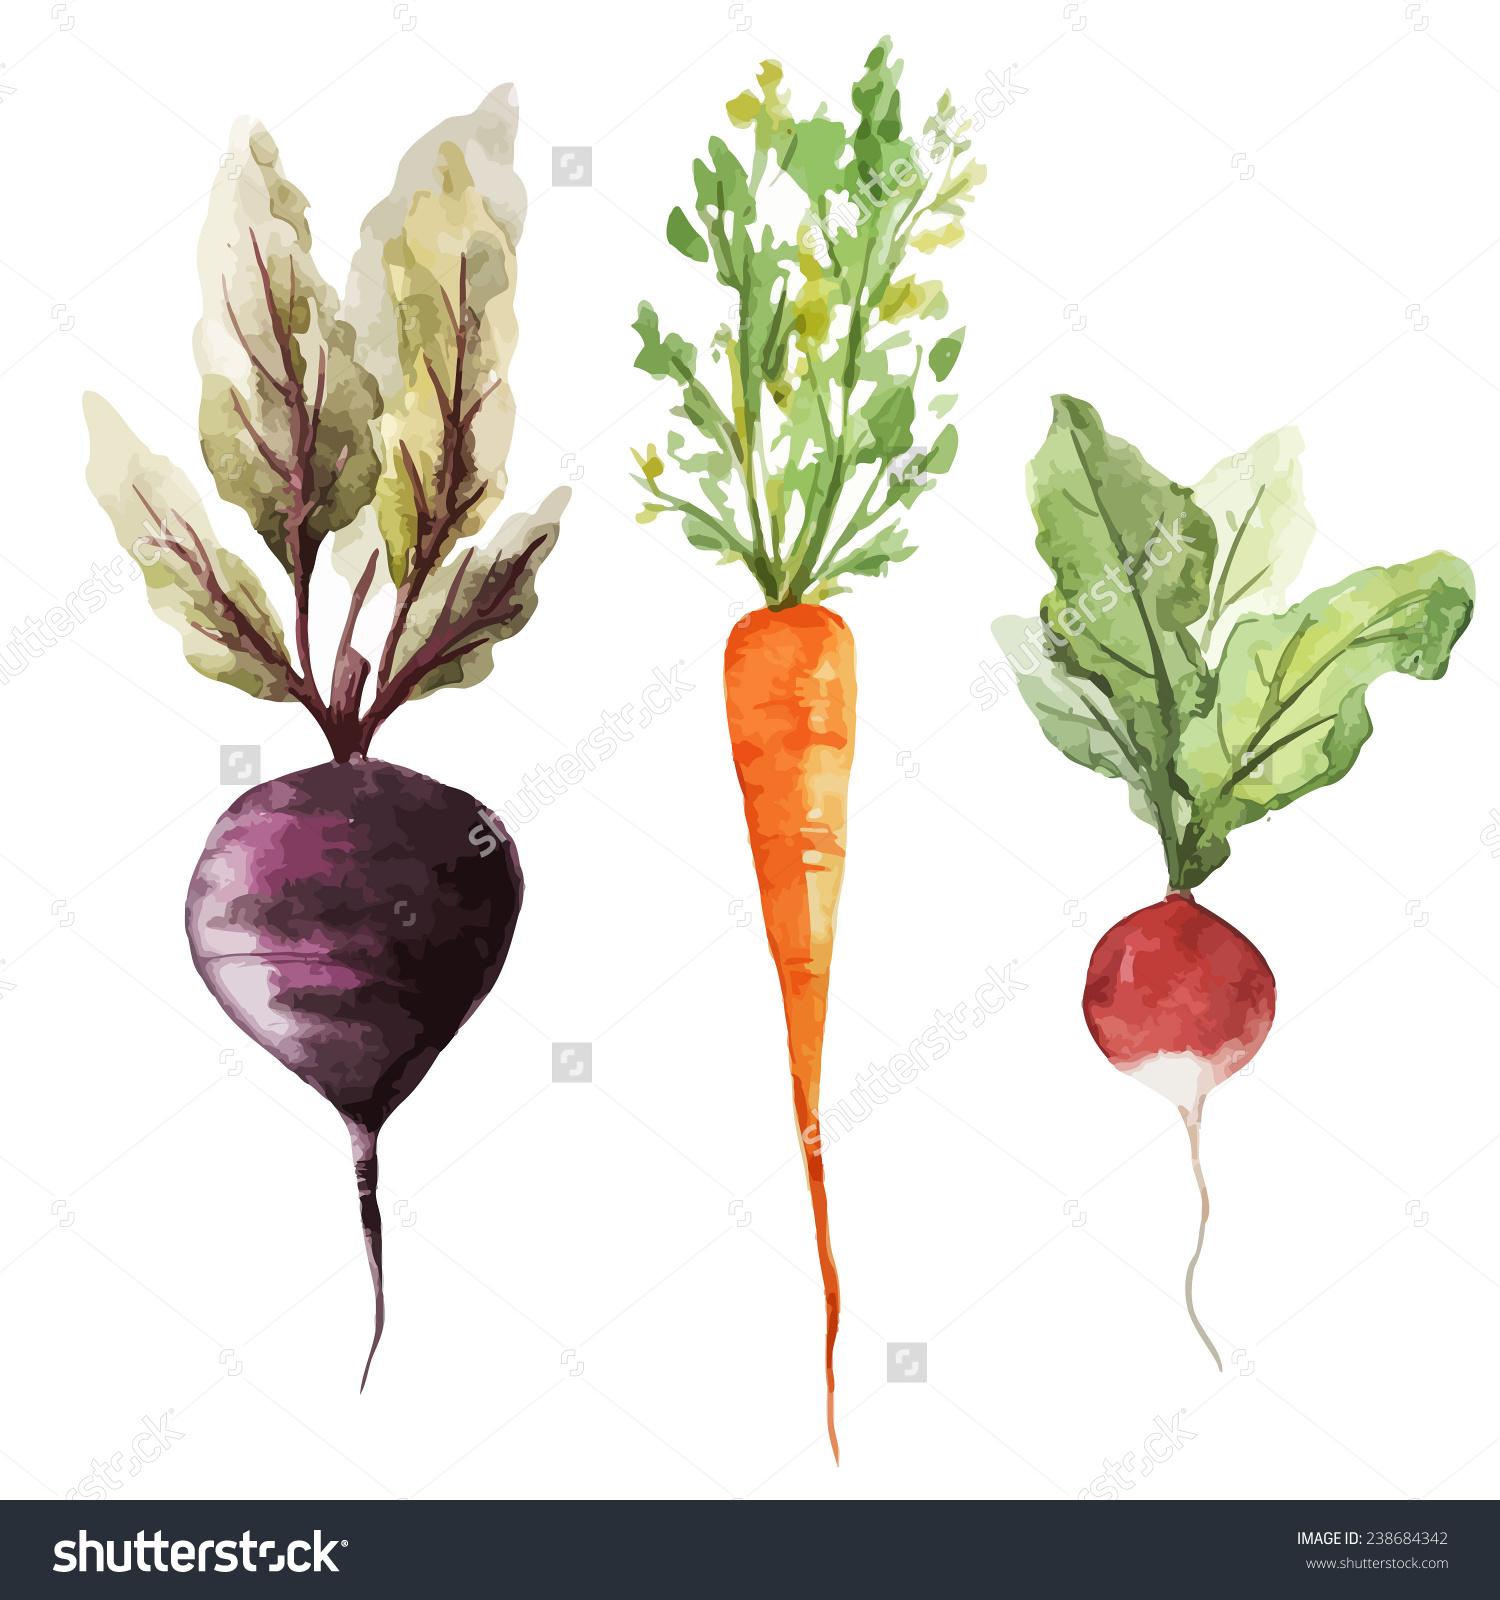 Root Vegetable Watercolor Vegetables Stock Vector 238684342.